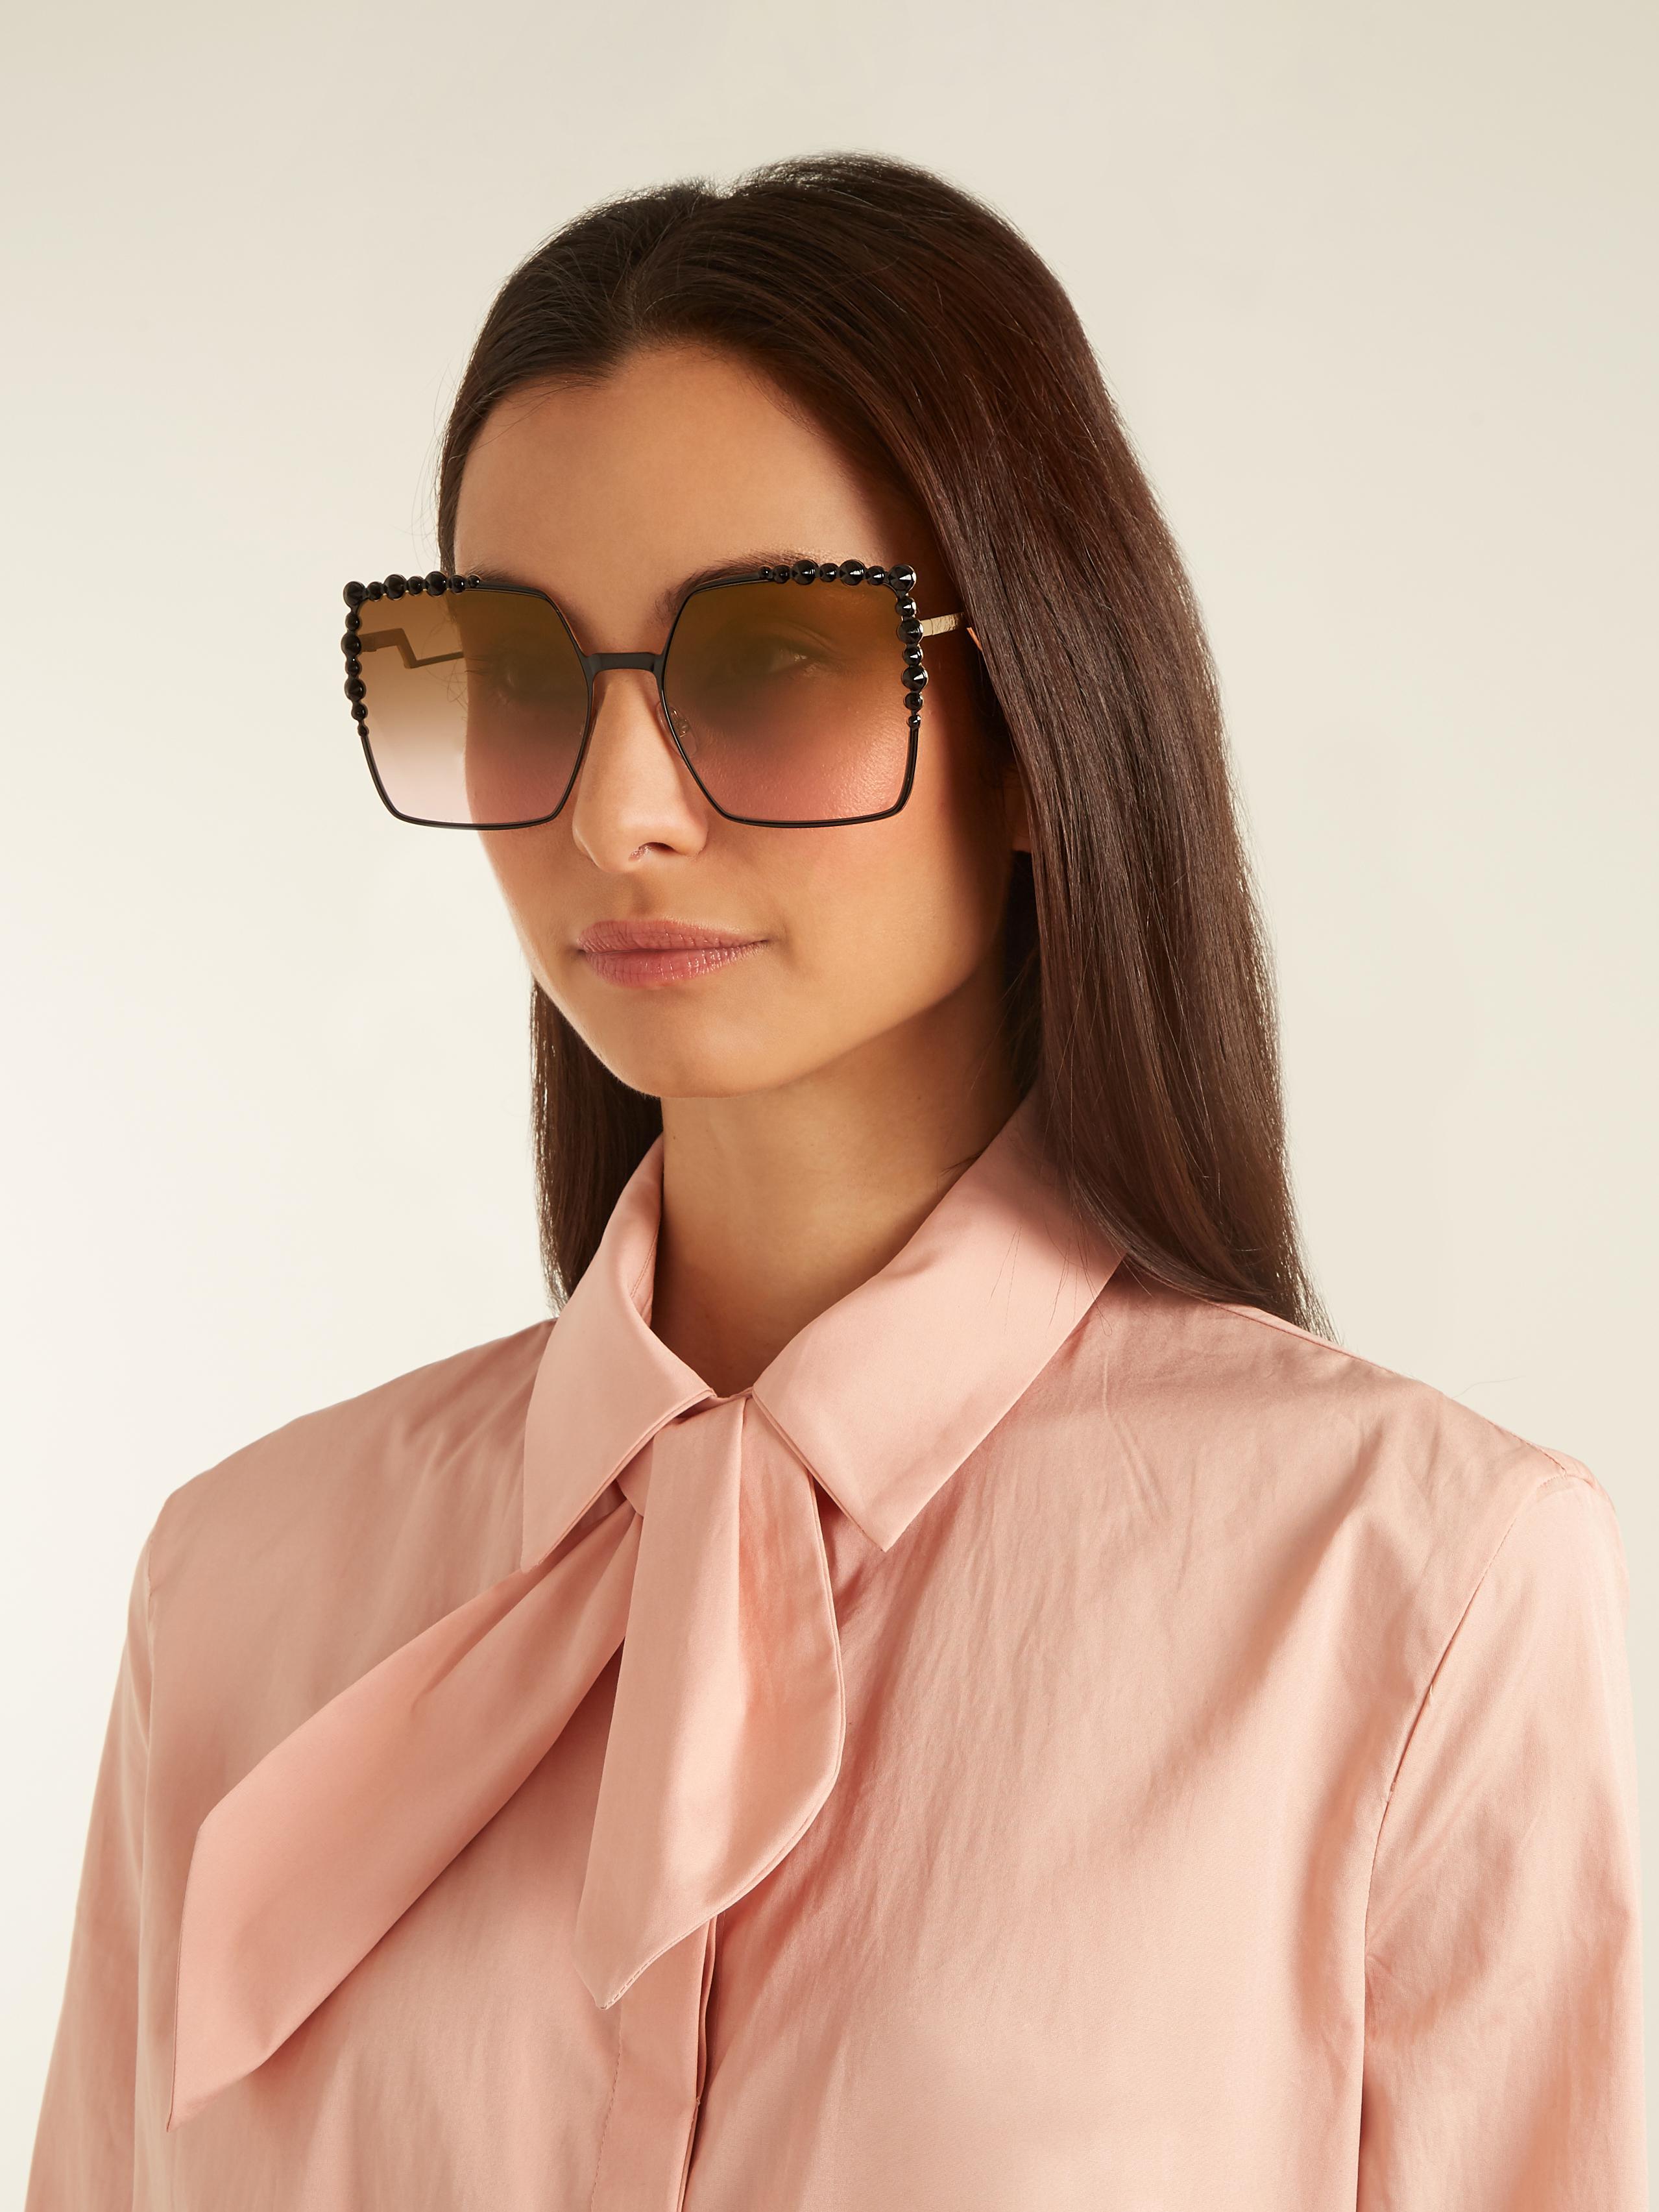 dce12c1bbfd4b Lyst Oversized Embellished Fendi Frame Sunglasses Square pWfgSRcp